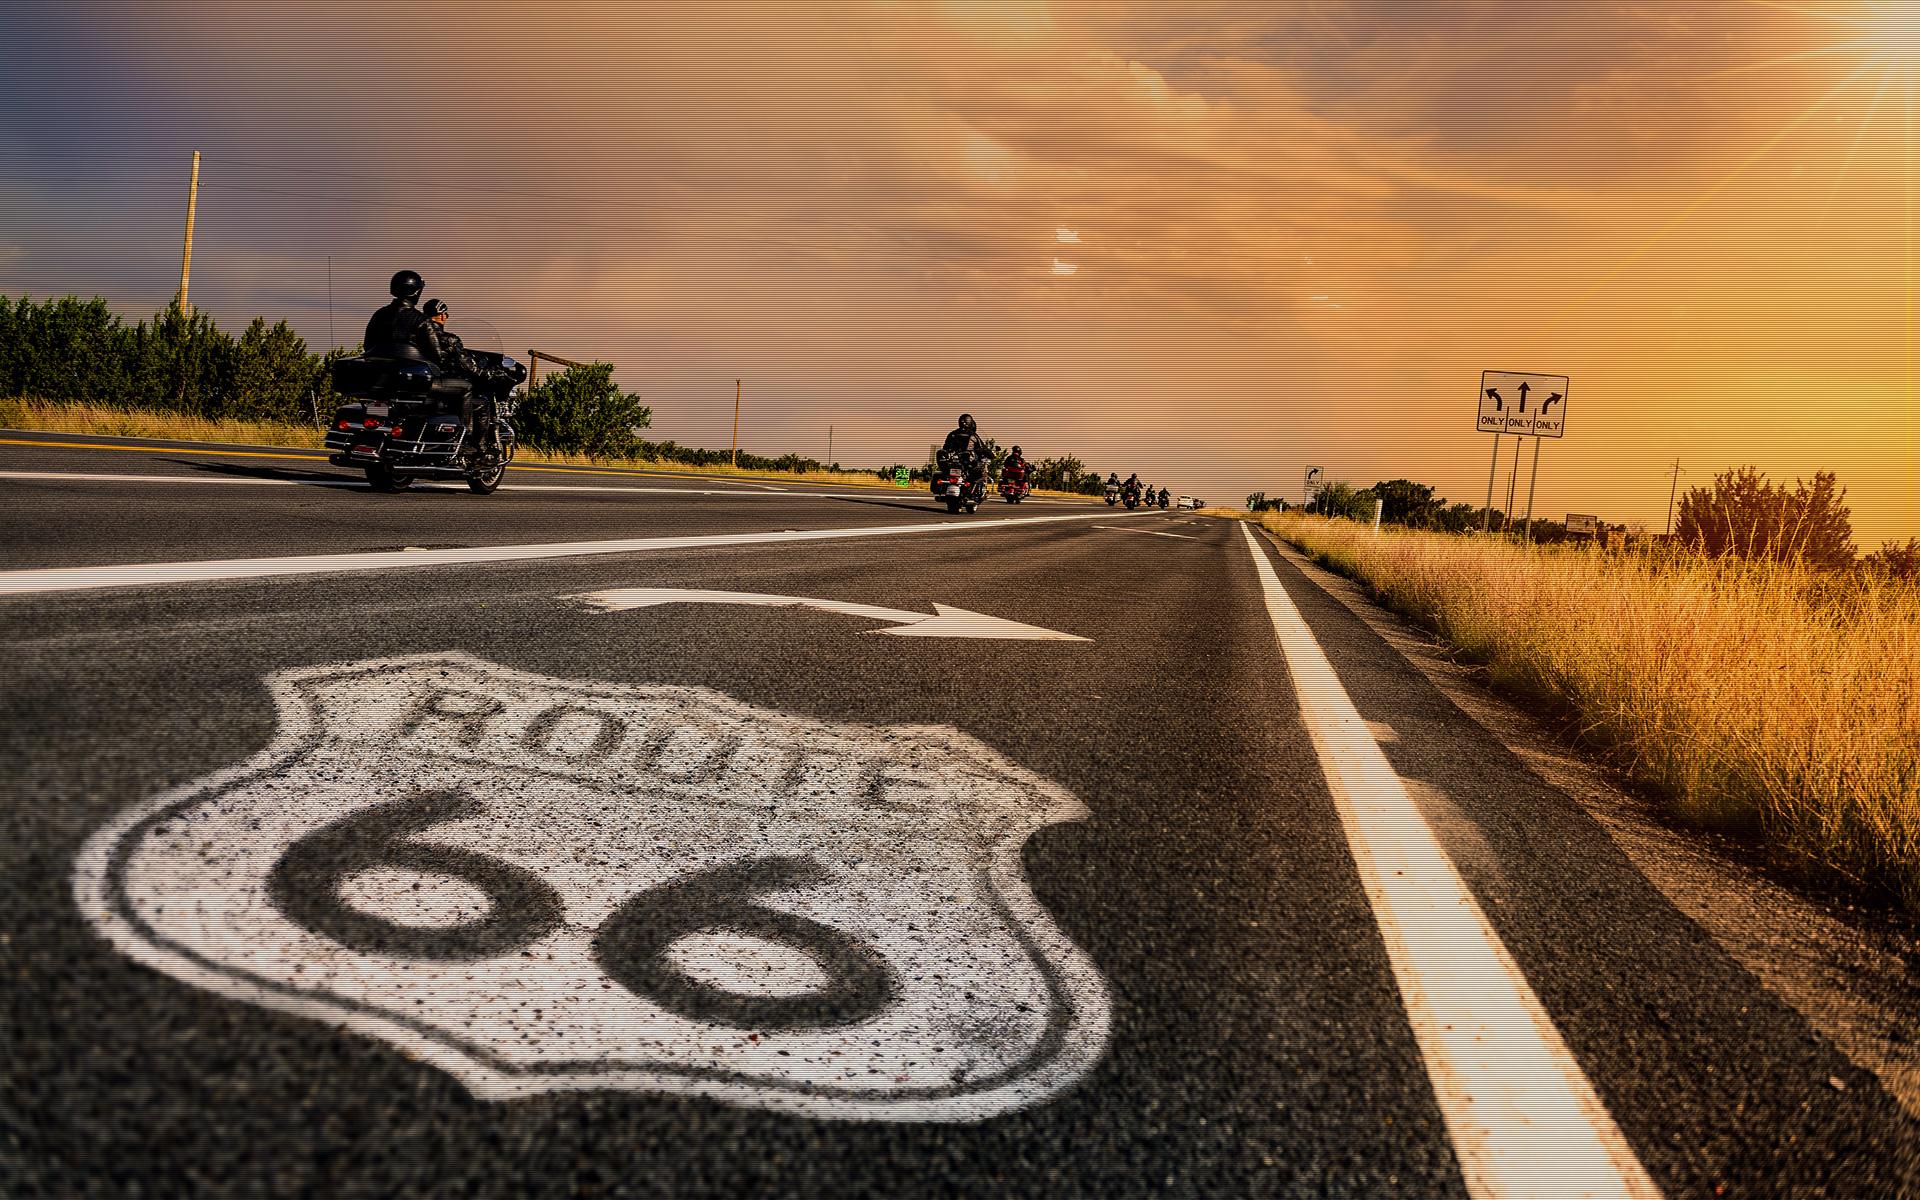 Tour Route 66